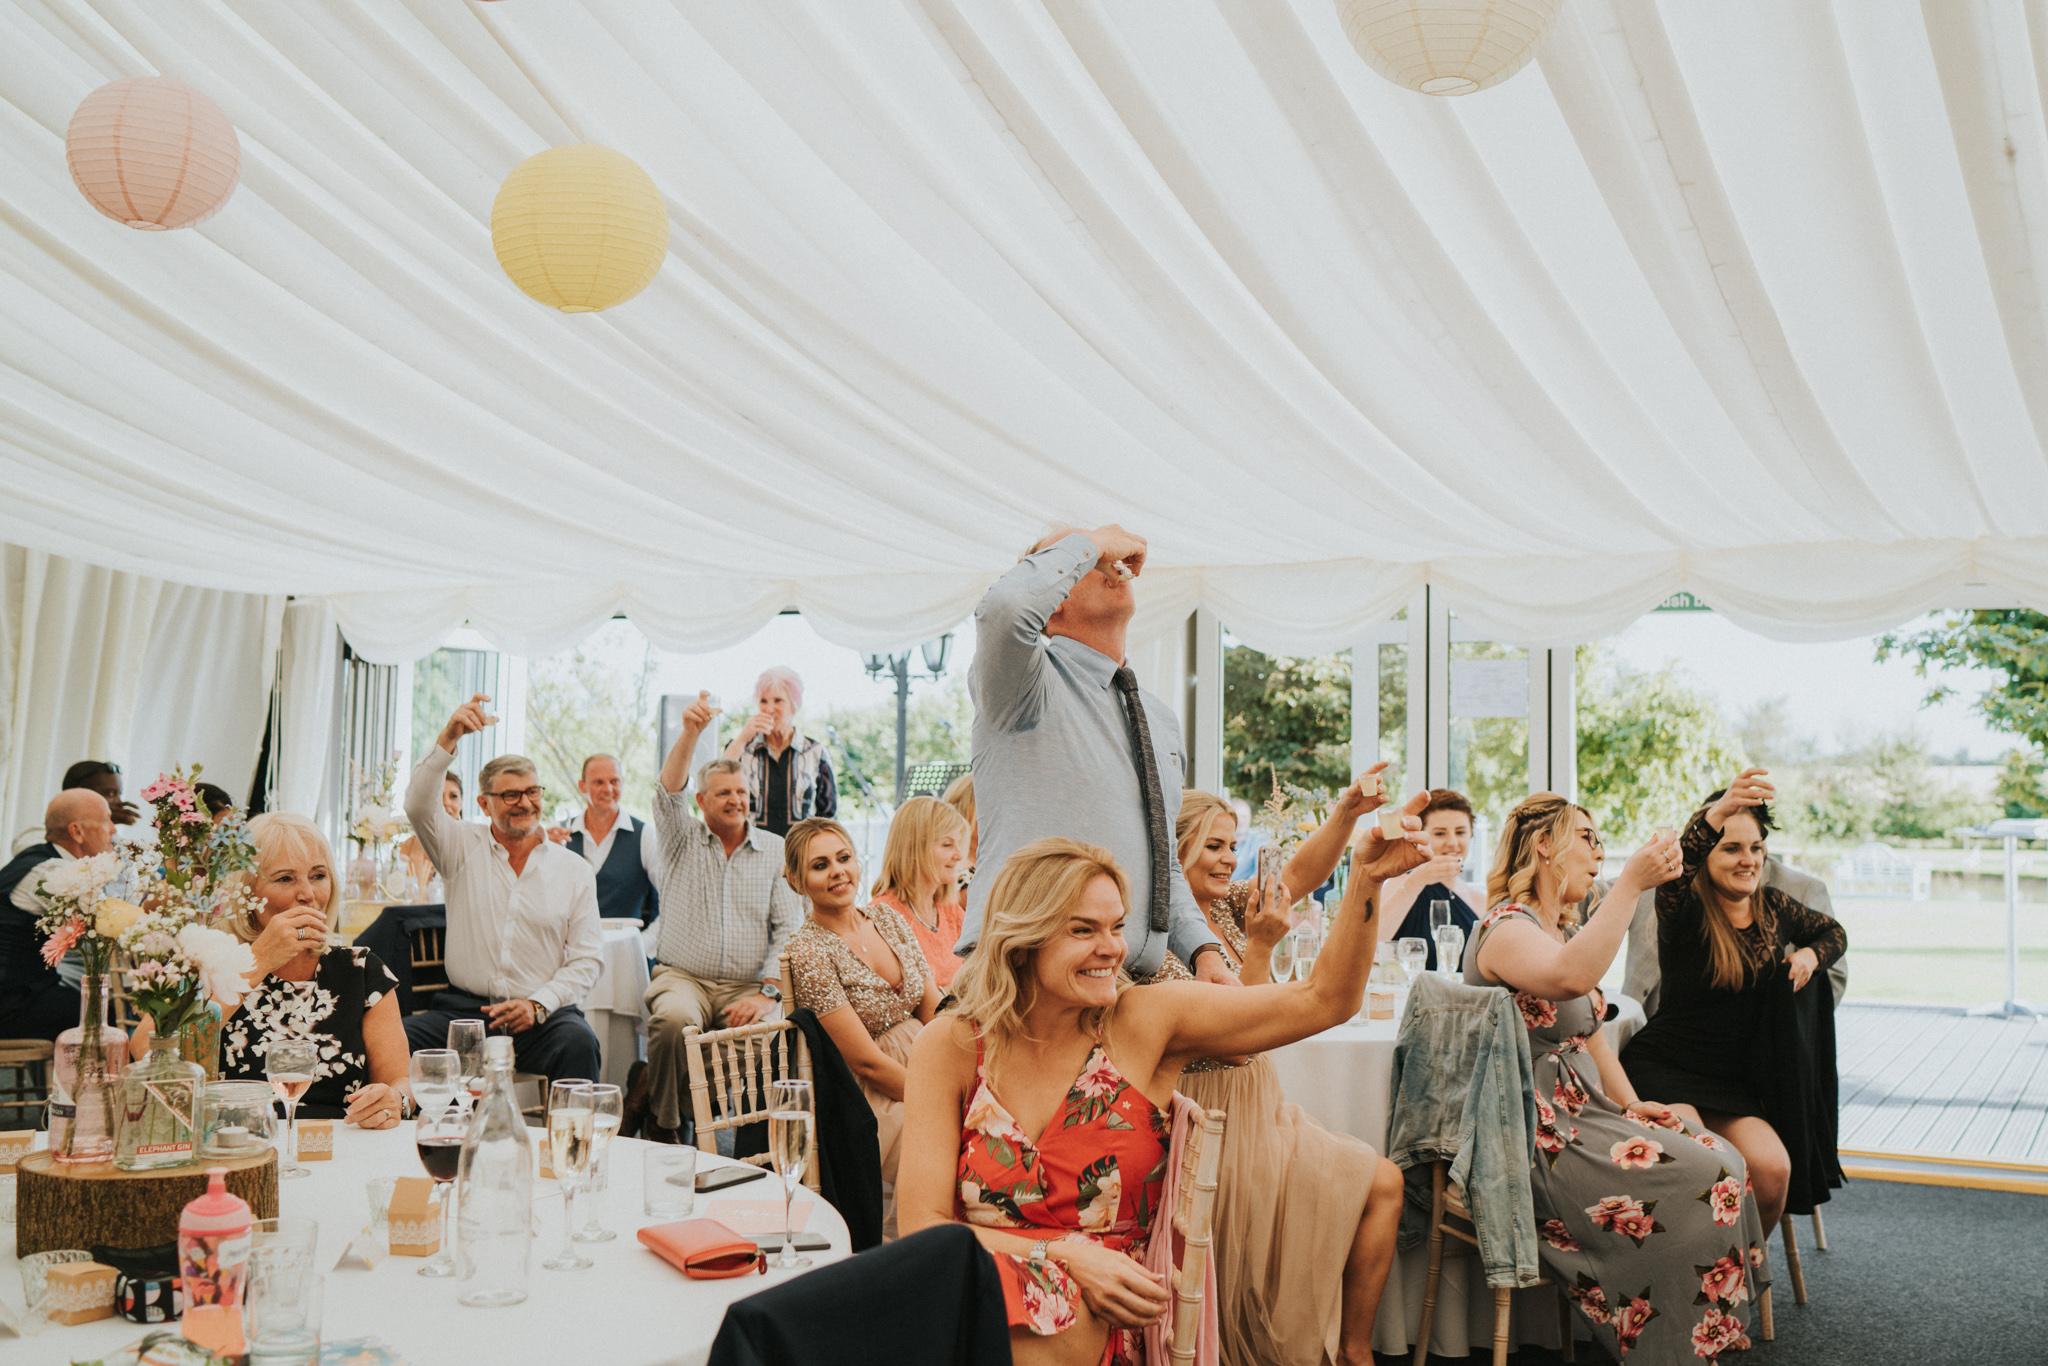 danielle-and-gareths-boho-wedding-previews-at-high-house-weddings-grace-elizabeth-colchester-essex-suffolk-norfolk-devon-alternative-wedding-and-lifestyle-photographer (61 of 76).jpg